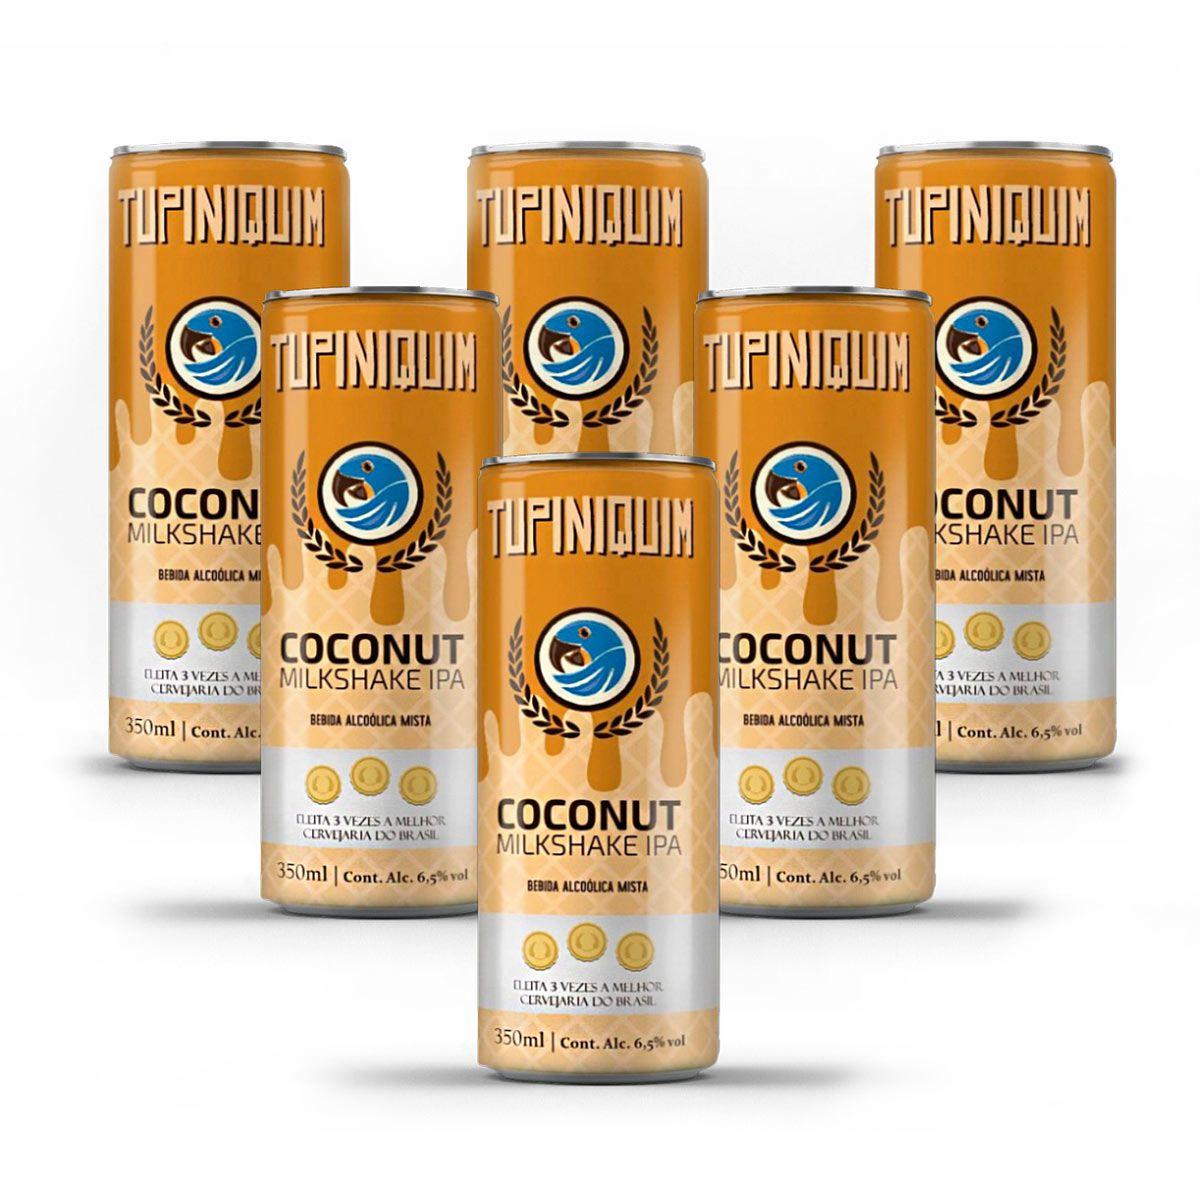 Pack Tupiniquim Coconut Milkshake IPA 6 cervejas 350ml  - RS BEER - Cervejas Gaúchas